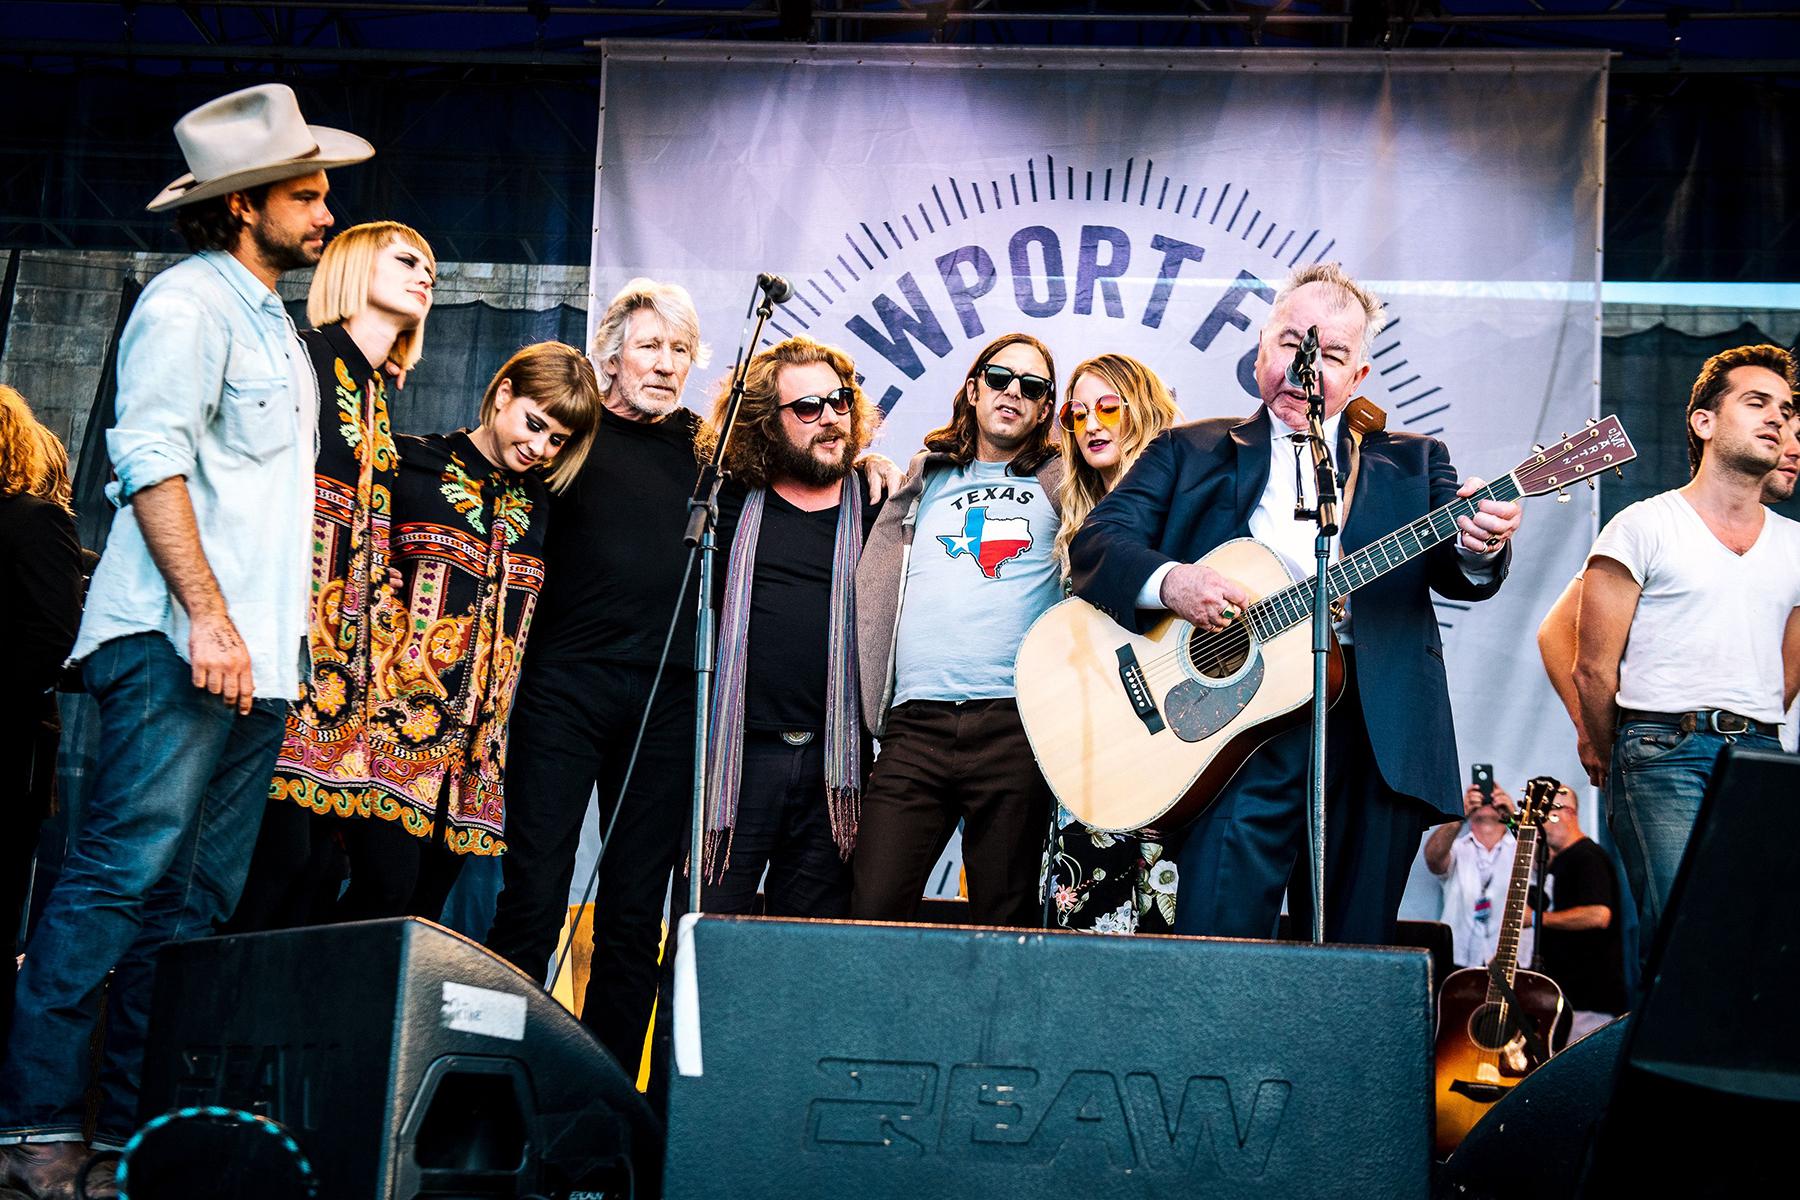 John Prine, Zach Williams, Lucius, Roger Waters, Jim James, Margo PriceNewport Folk Festival, USA - 30 Jul 2017